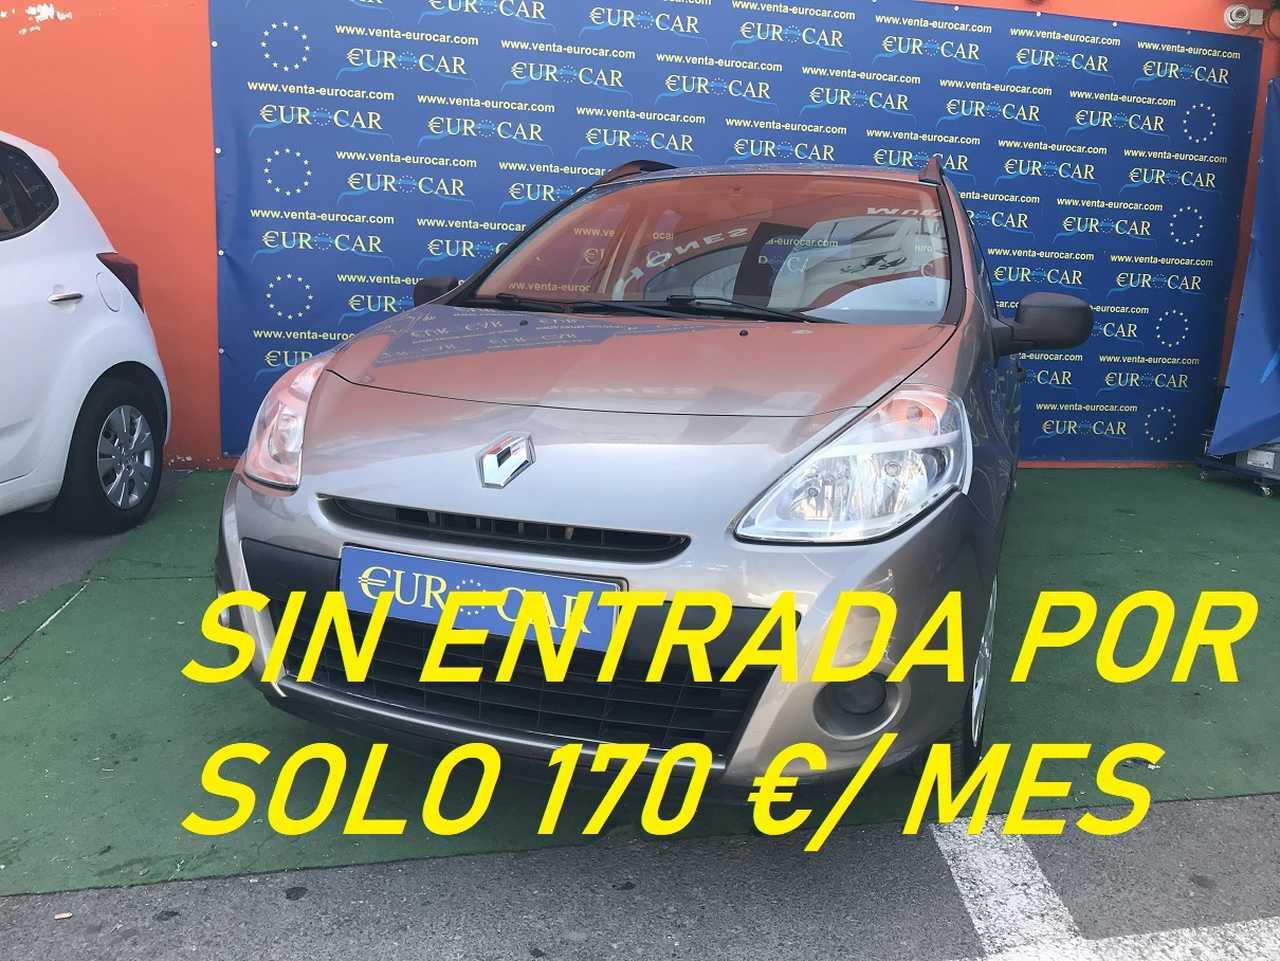 Renault Clio 1.2 I GRAND TOUR   - Foto 1